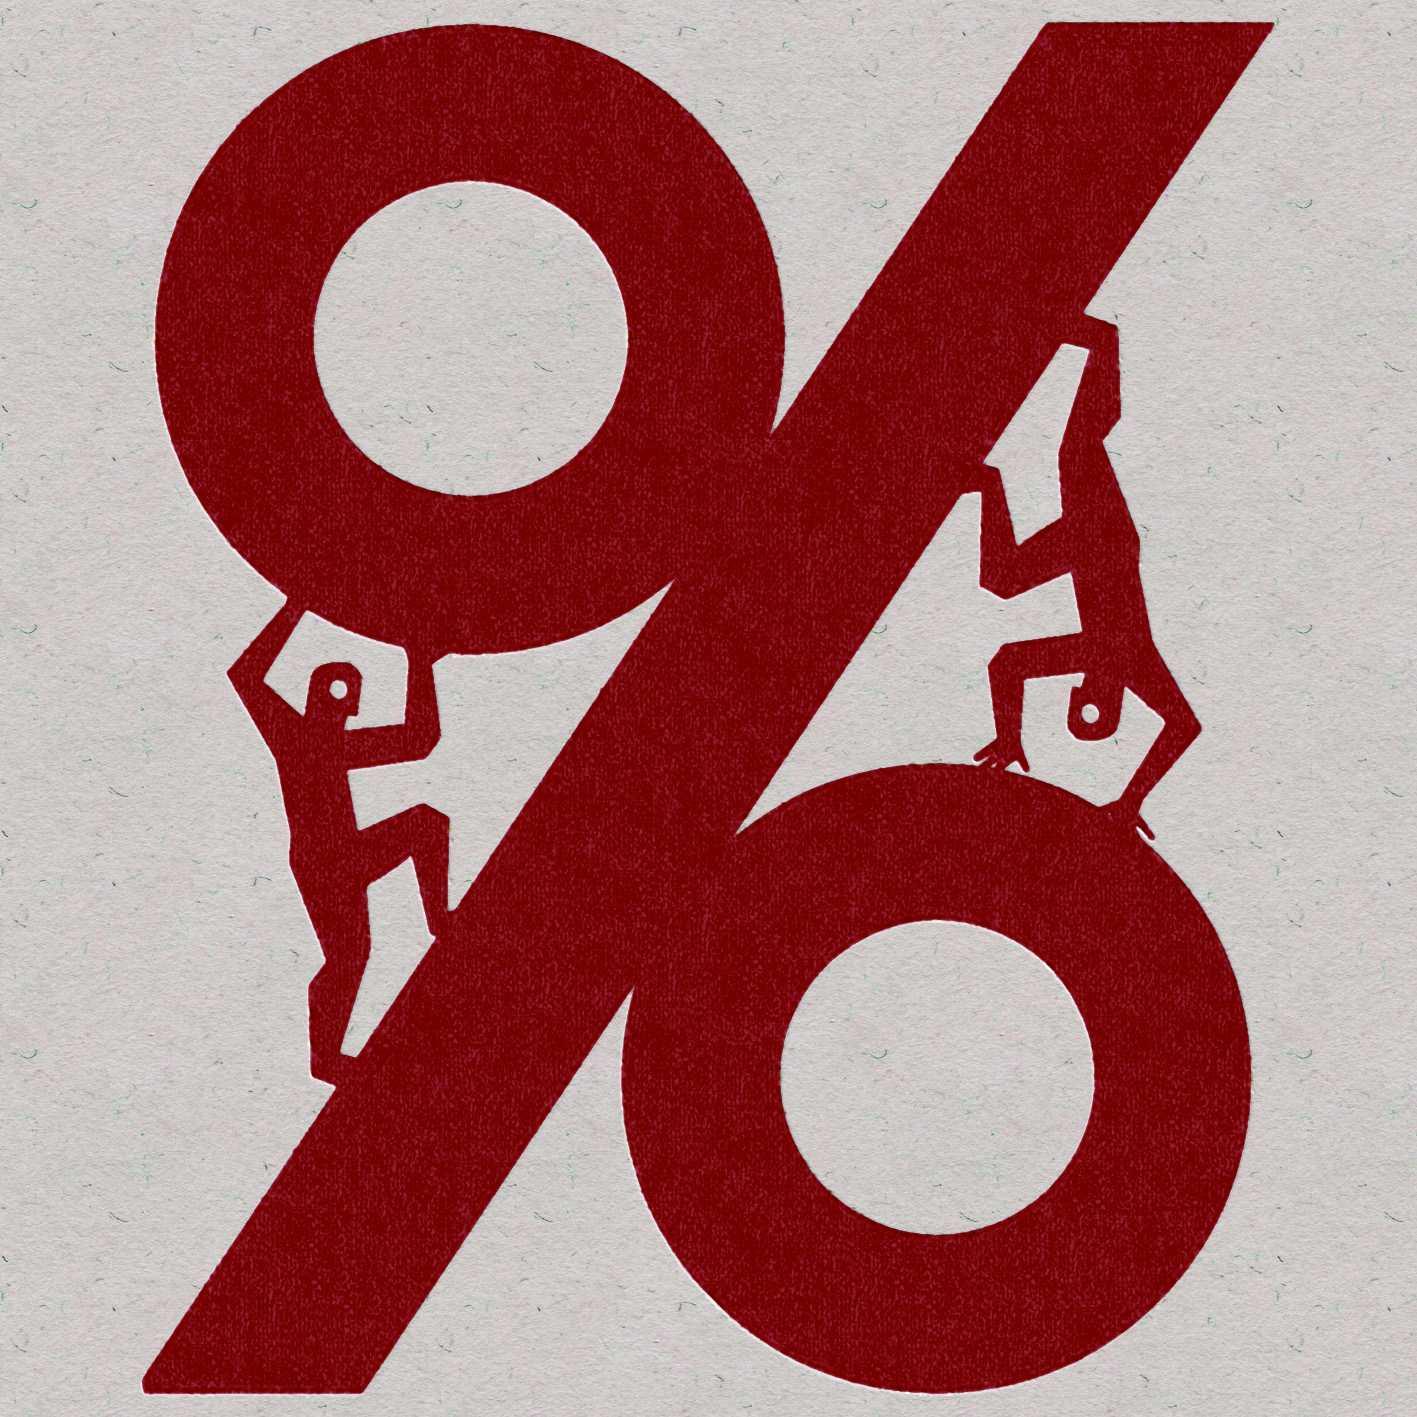 austeridade_fiscal_baixa